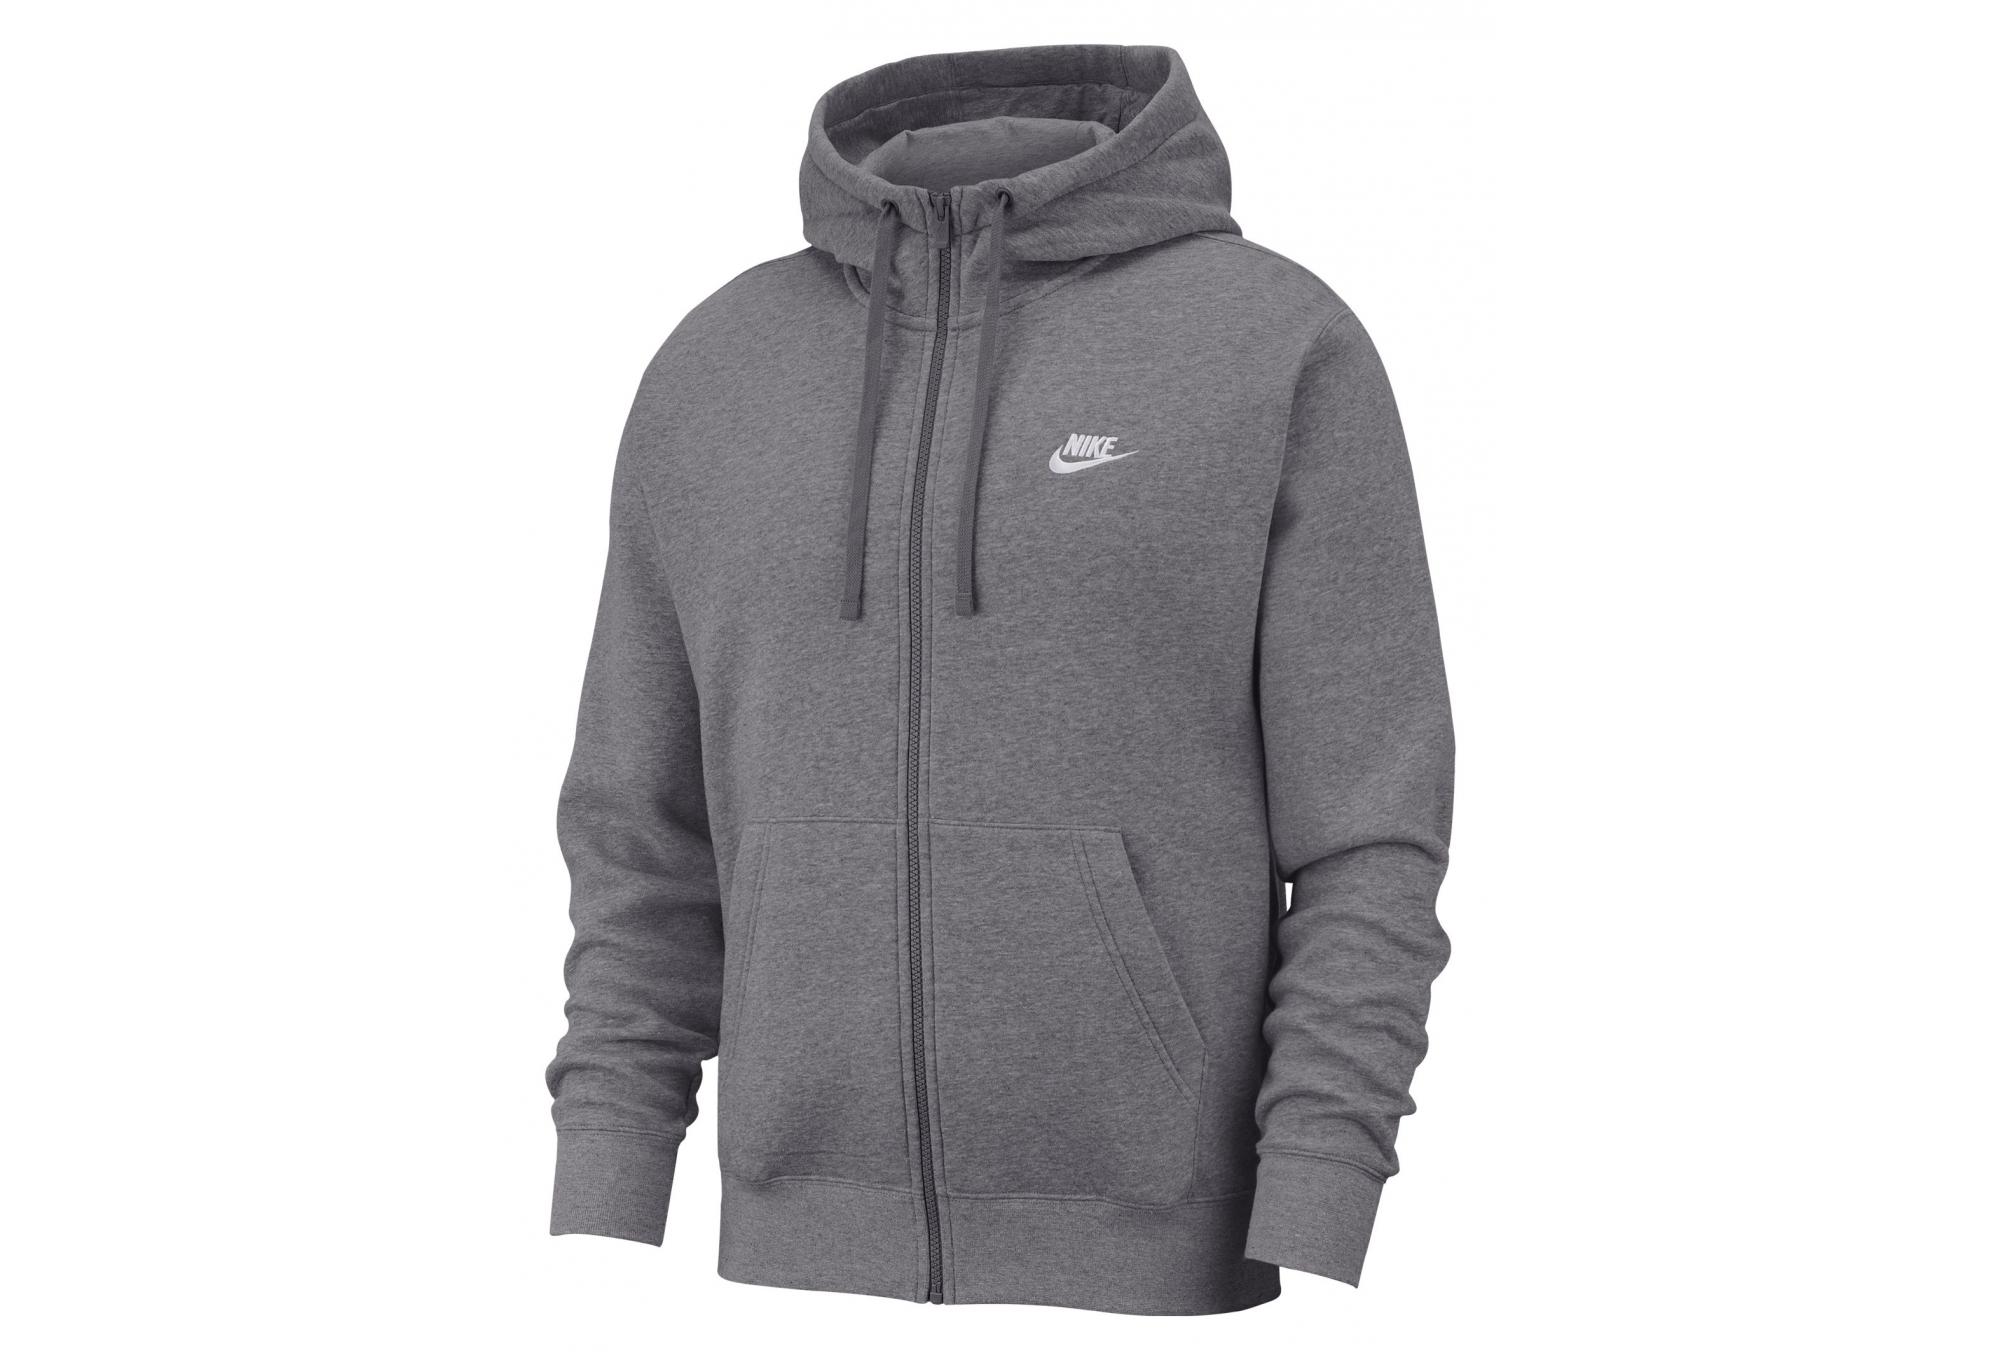 Nike Sportswear Club Fleece Charcoal Heathr Anthracite White